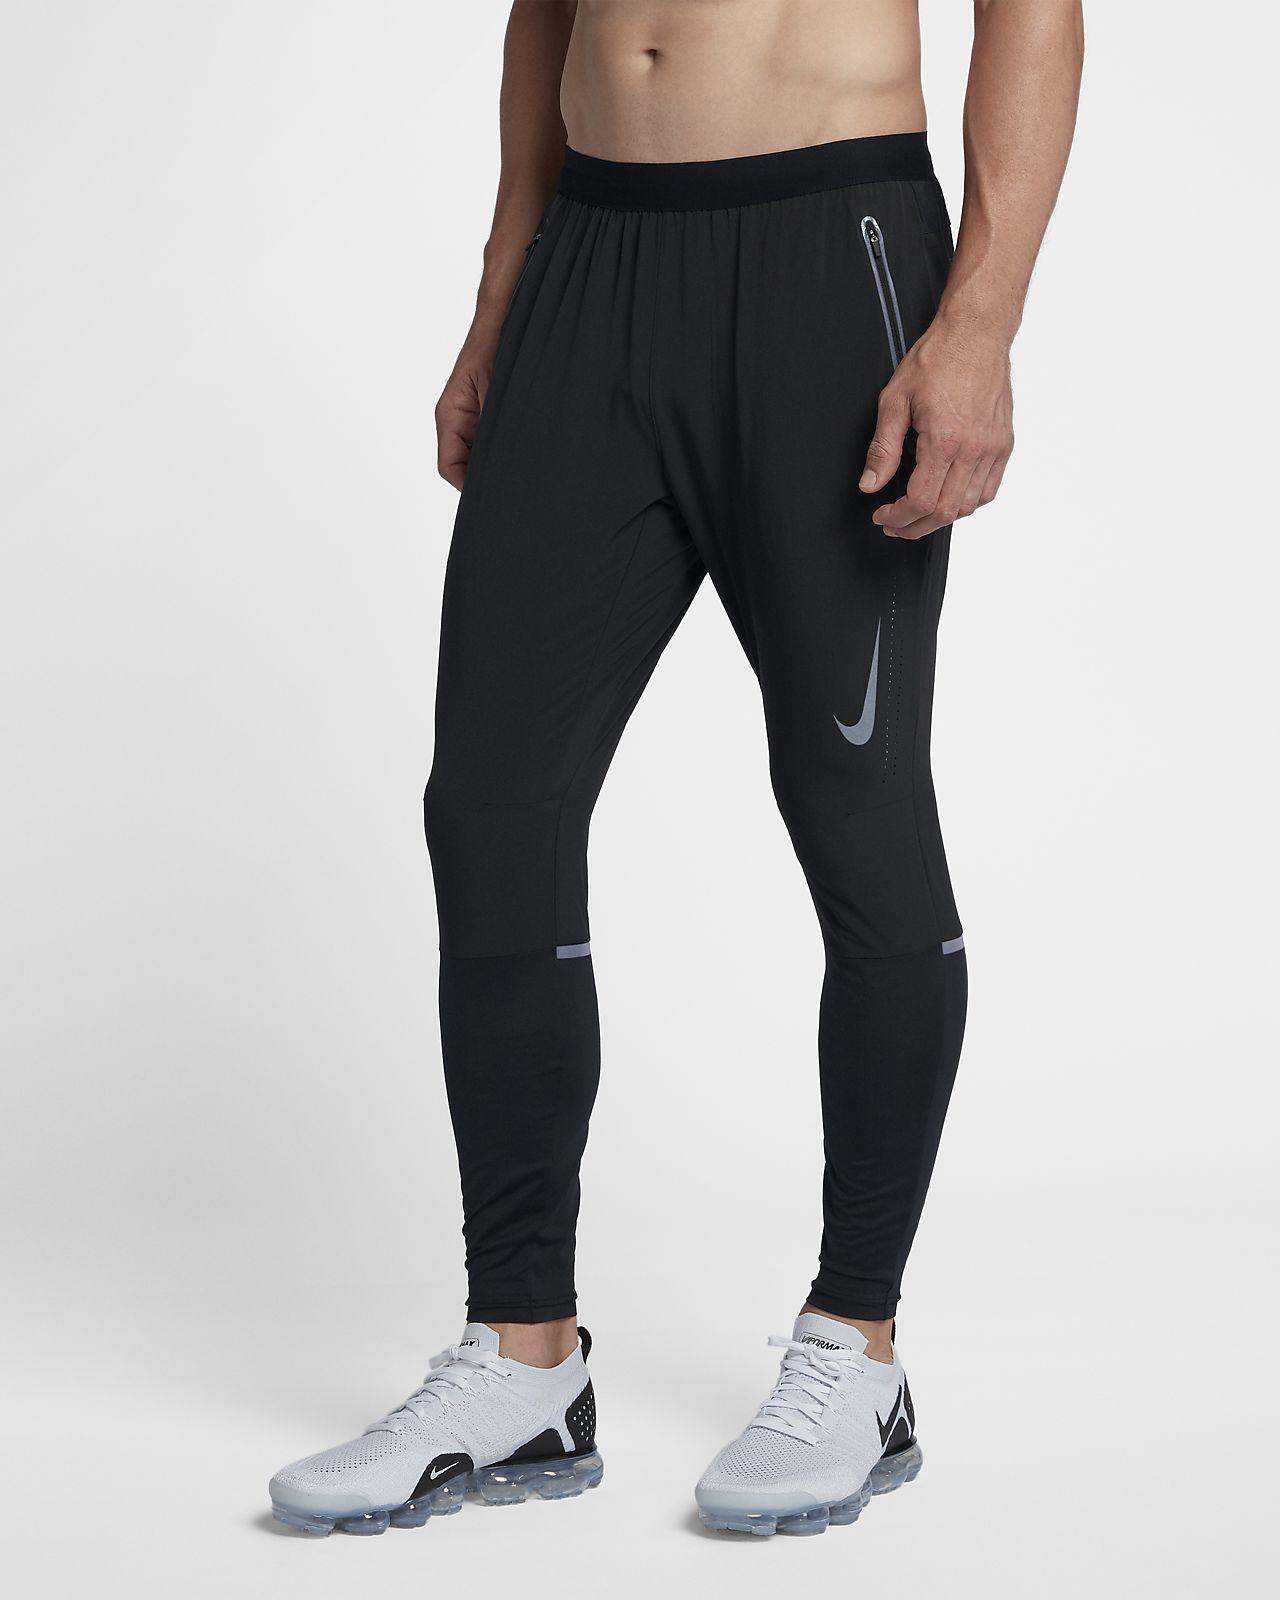 764b94c5f53e78 Low Resolution Nike Swift Hardloopbroek heren Nike Swift Hardloopbroek heren